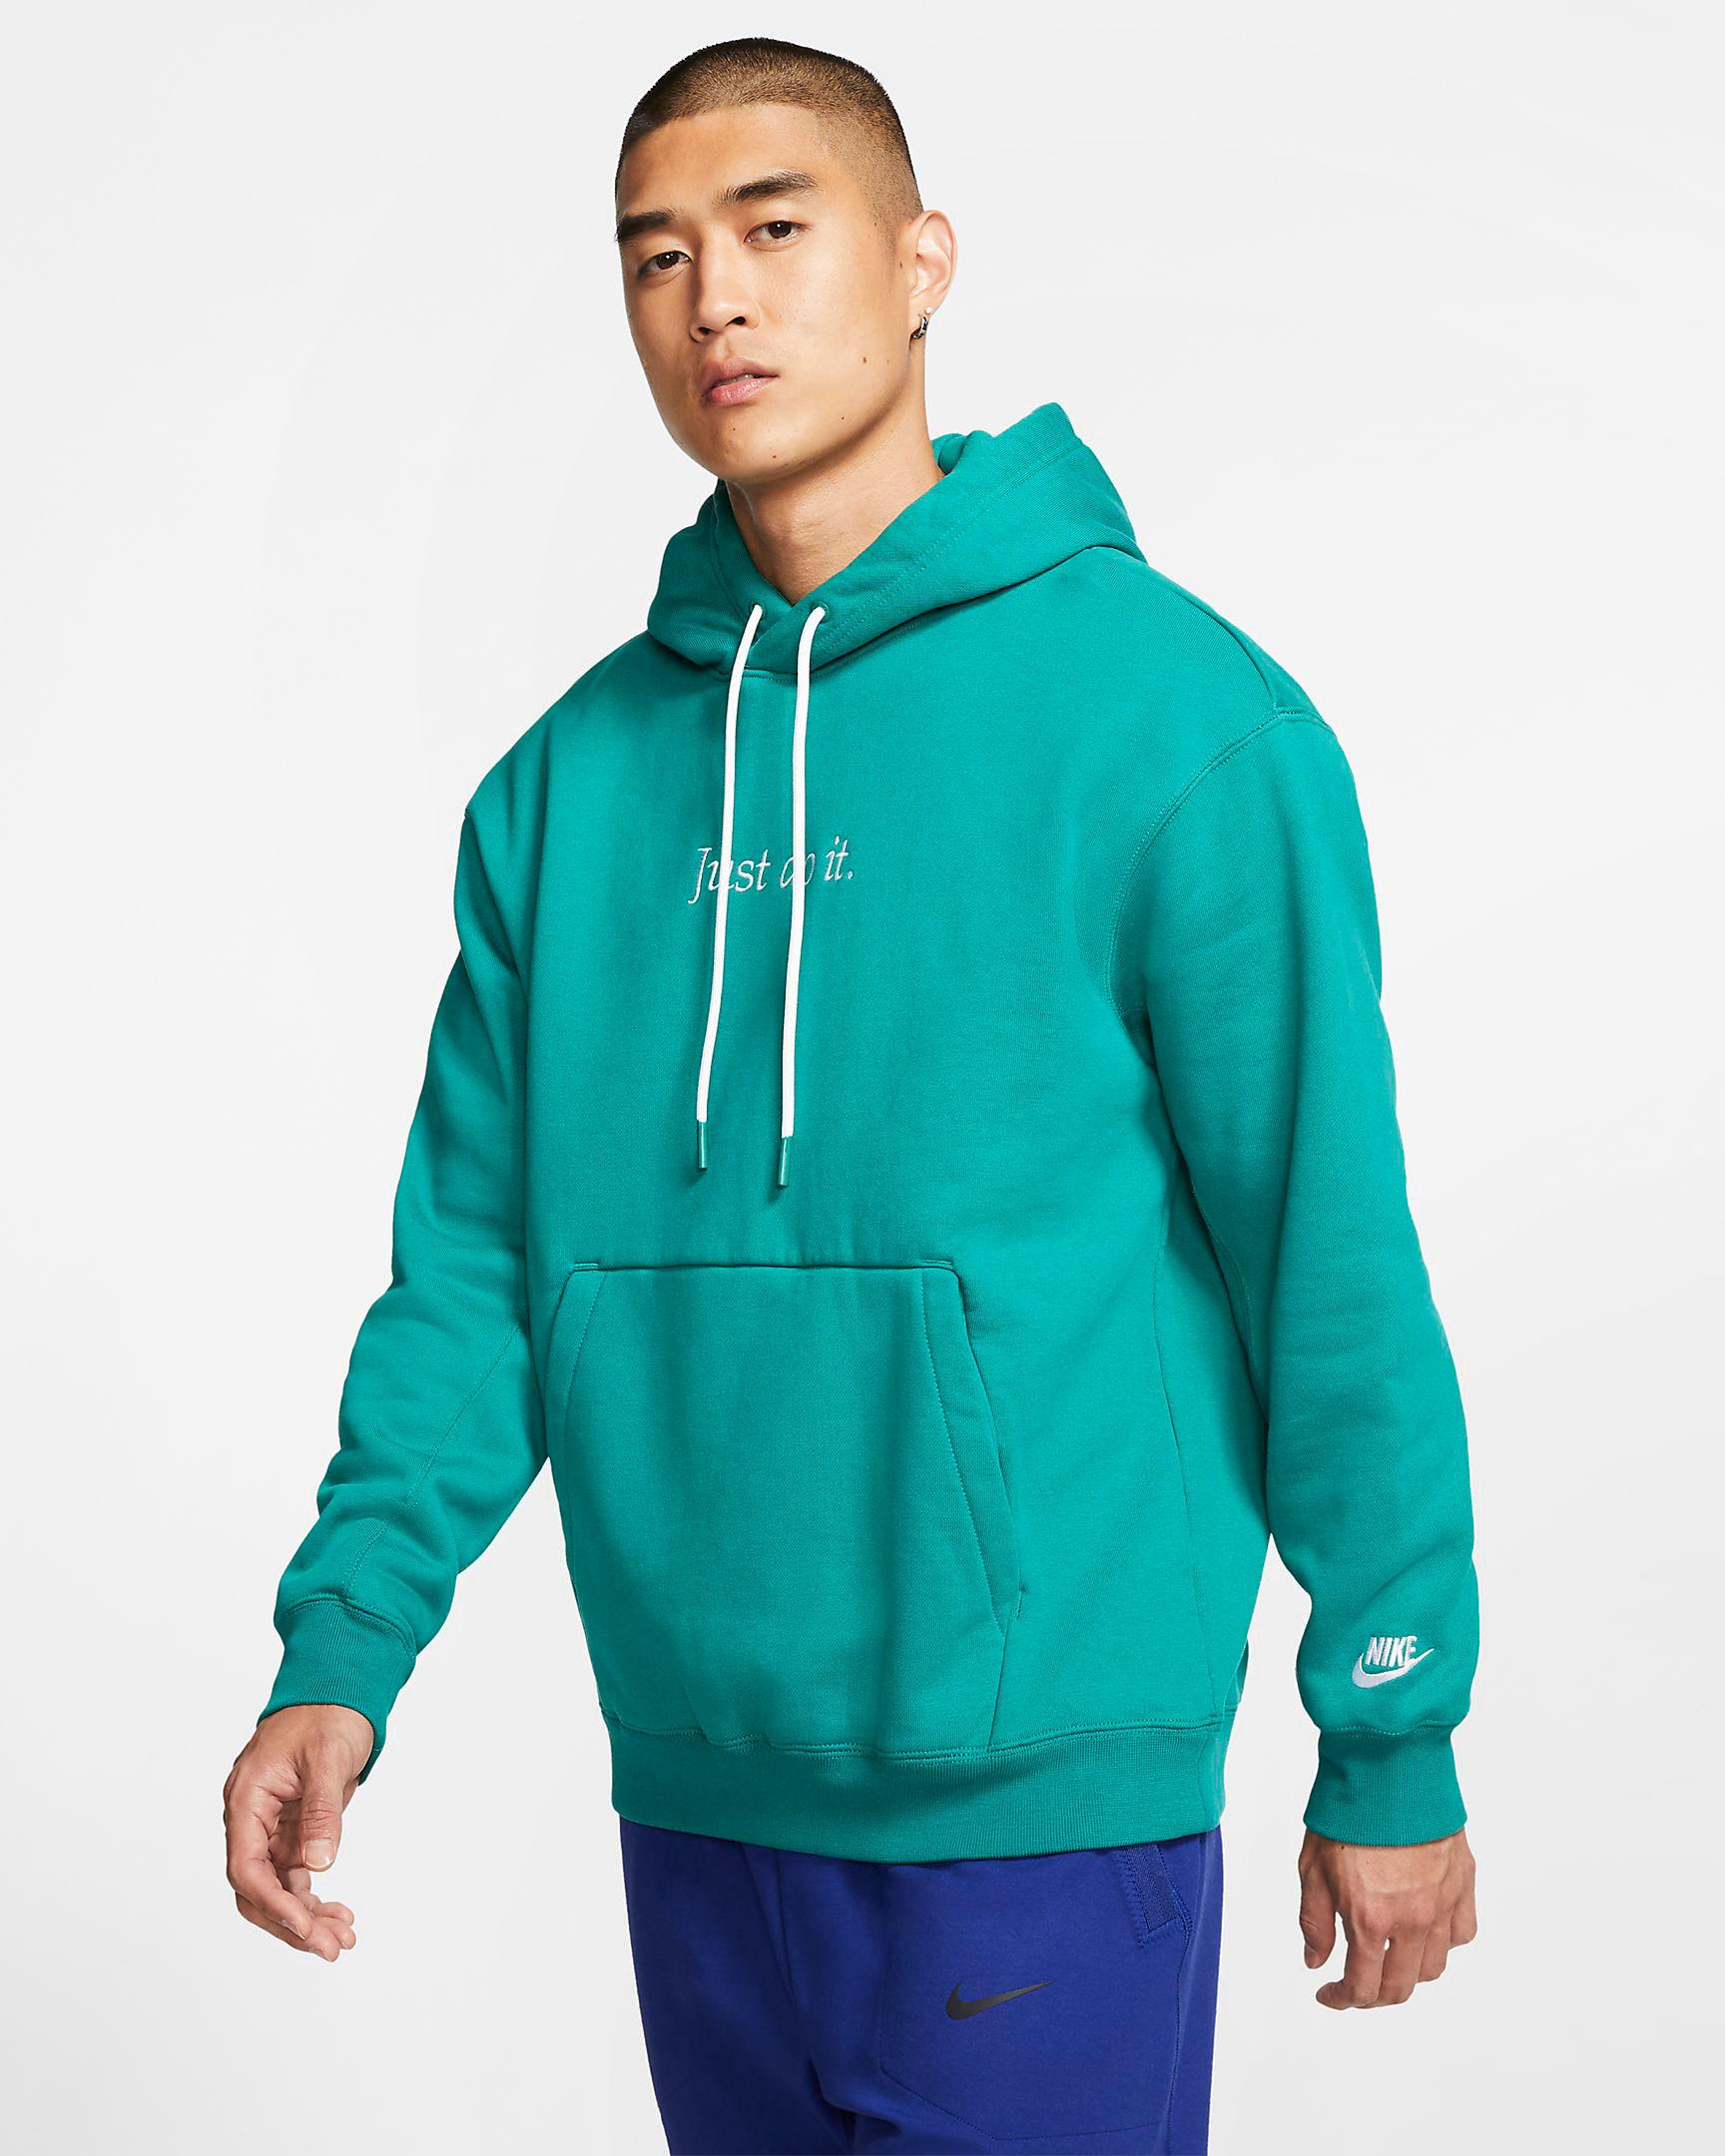 nike-island-green-just-do-it-hoodie-2